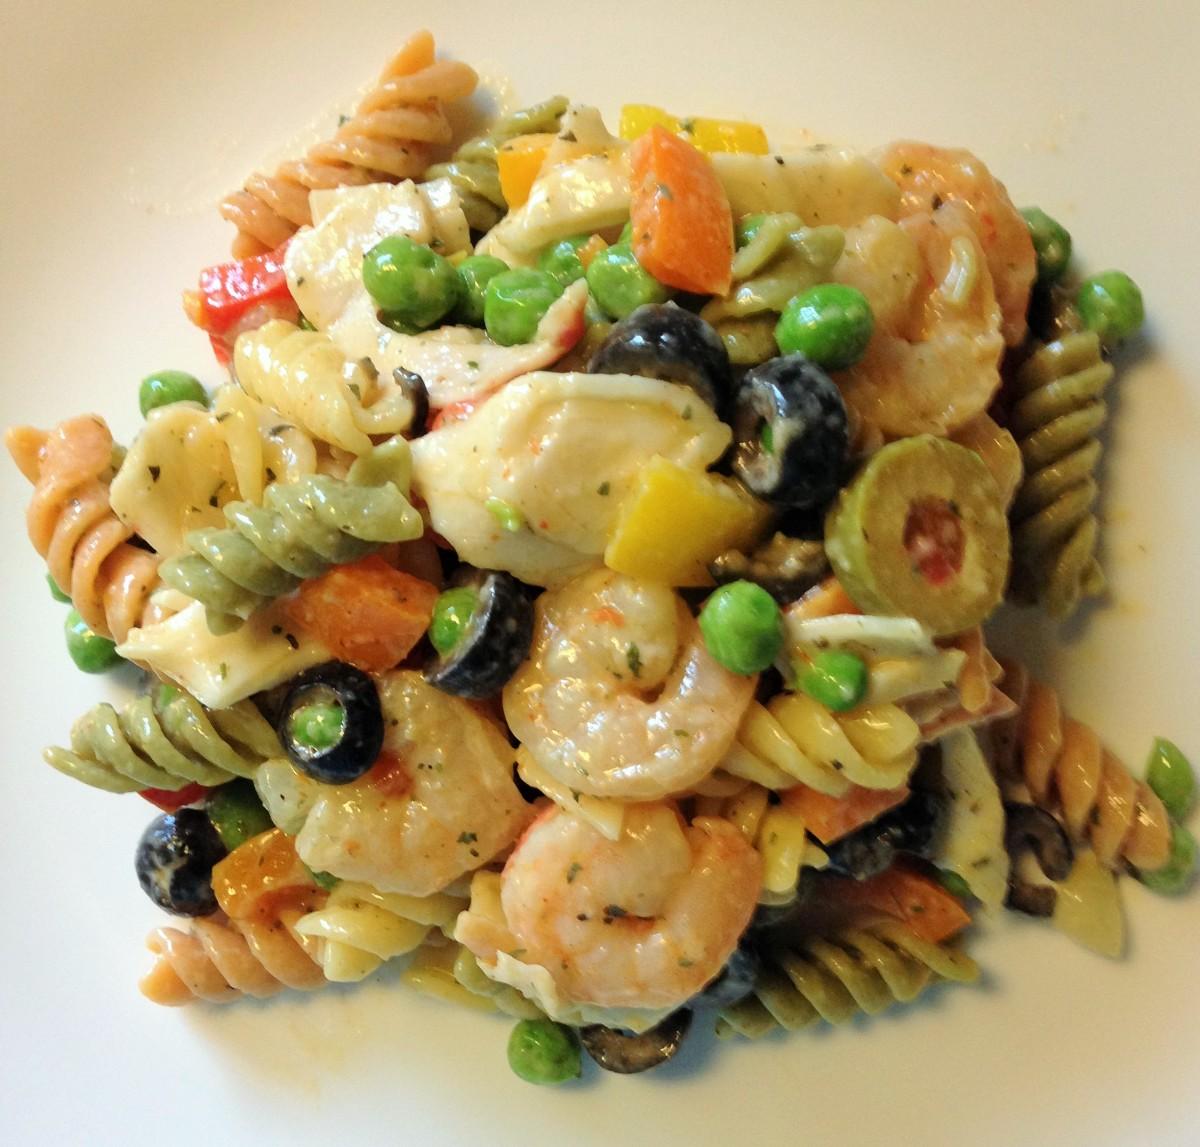 Recipe for Optional Seafood Pasta Salad